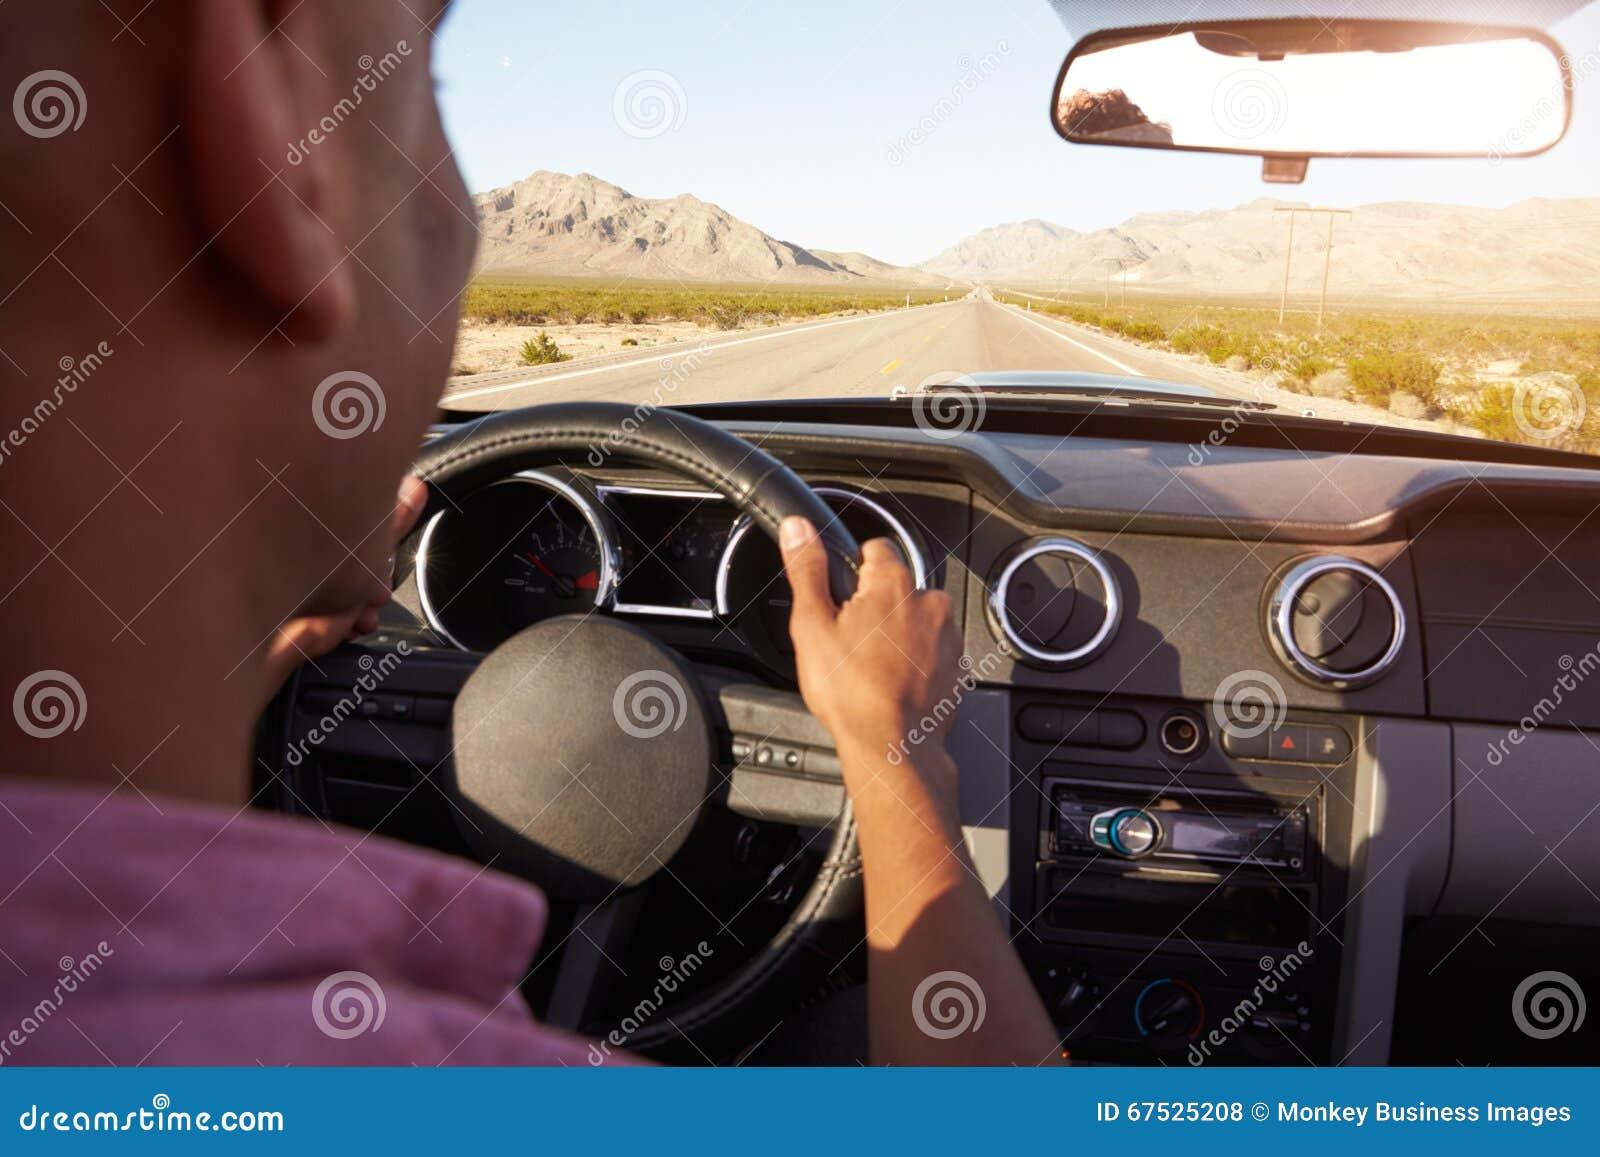 Car Driving Through Desert Description